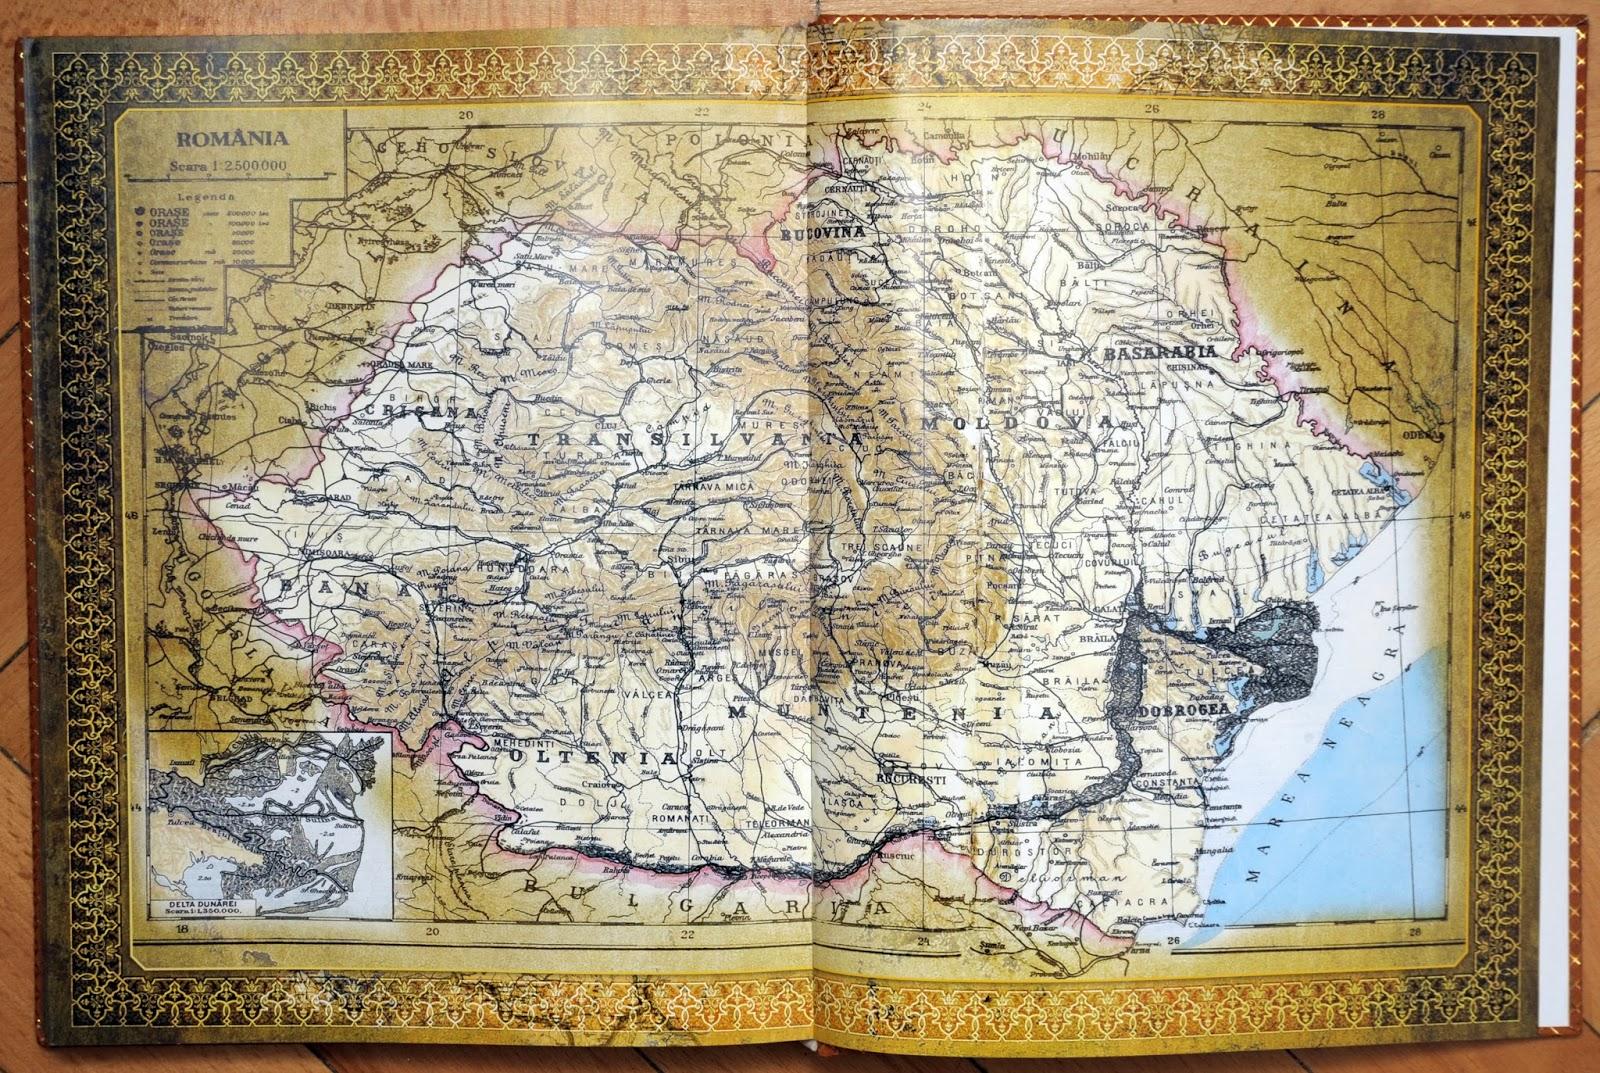 Istoria neamului romanesc - harta Romaniei mari